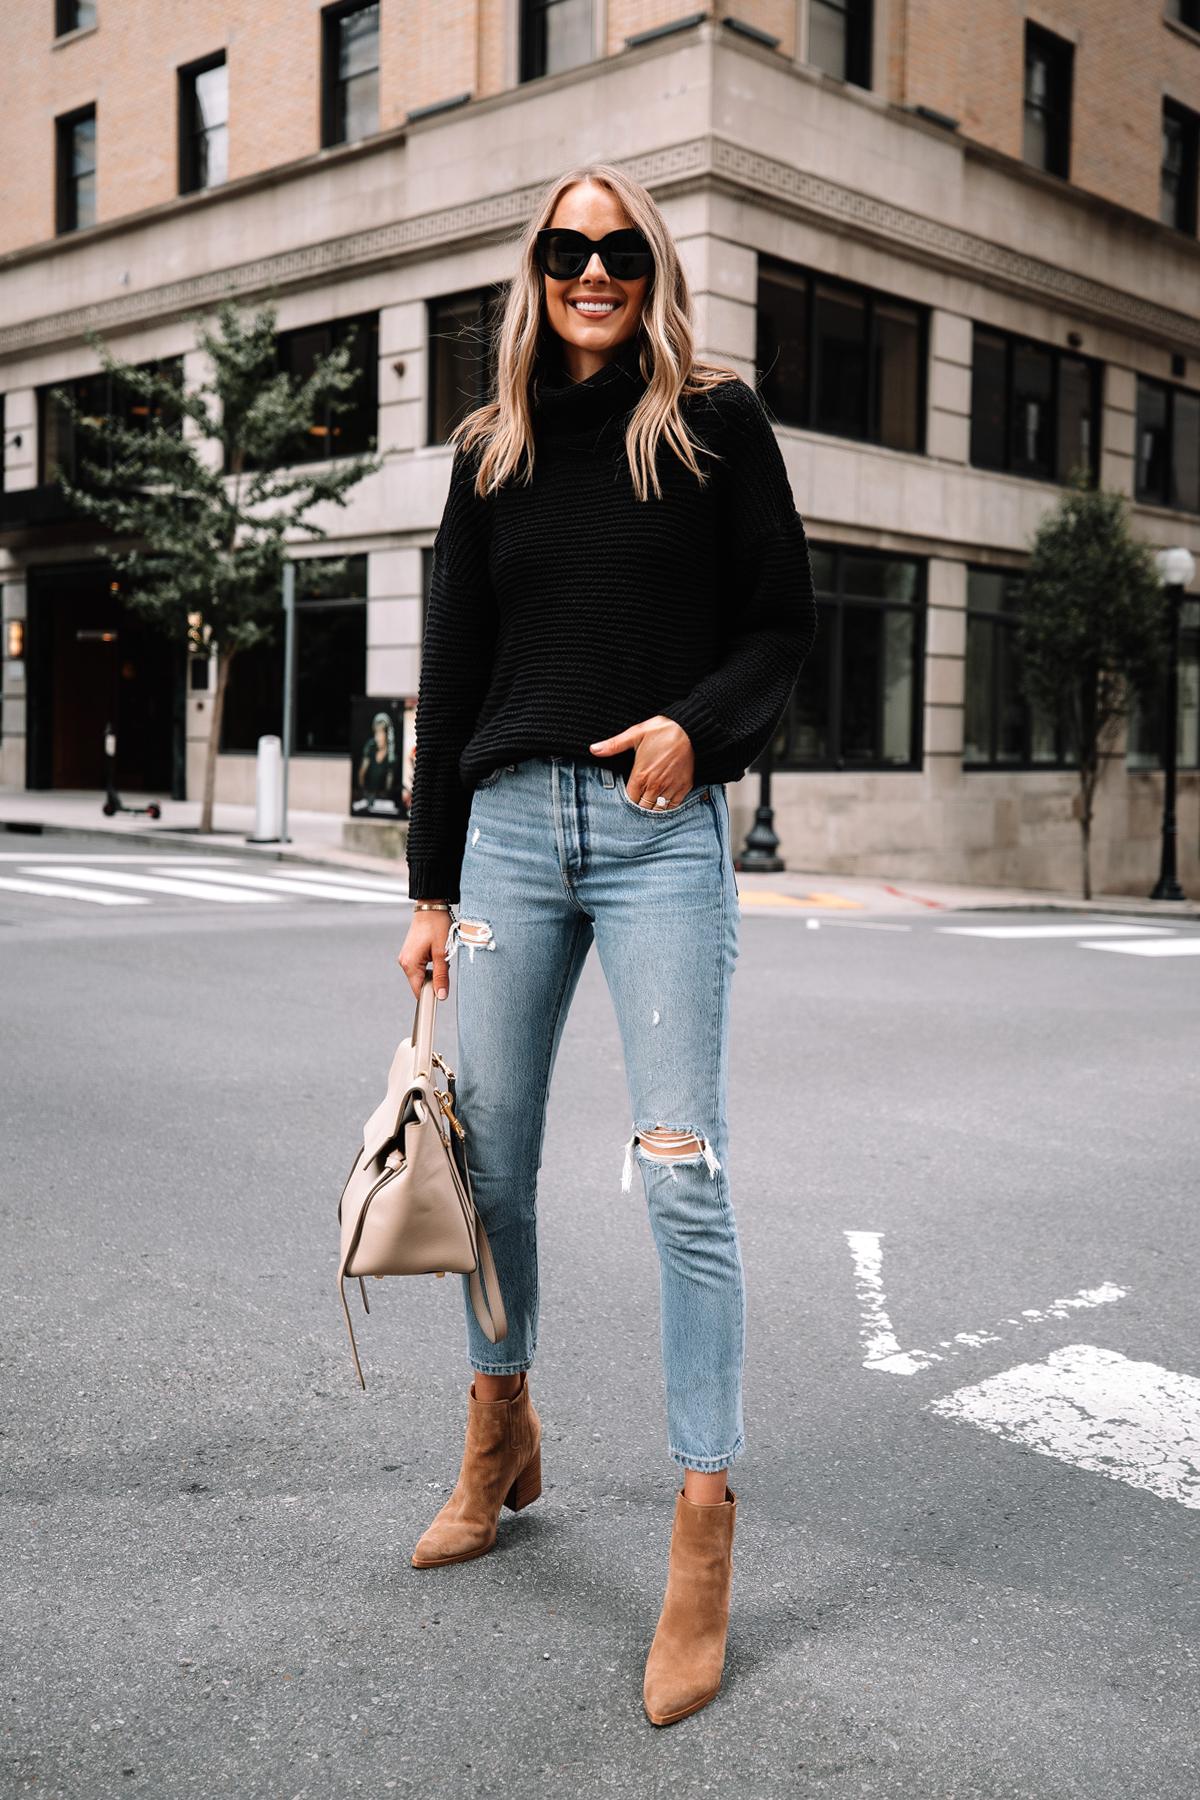 Fashion Jackson Wearing Amazon Fashion Black Turtleneck Sweater Levis Ripped Jeans Tan Suede Booties